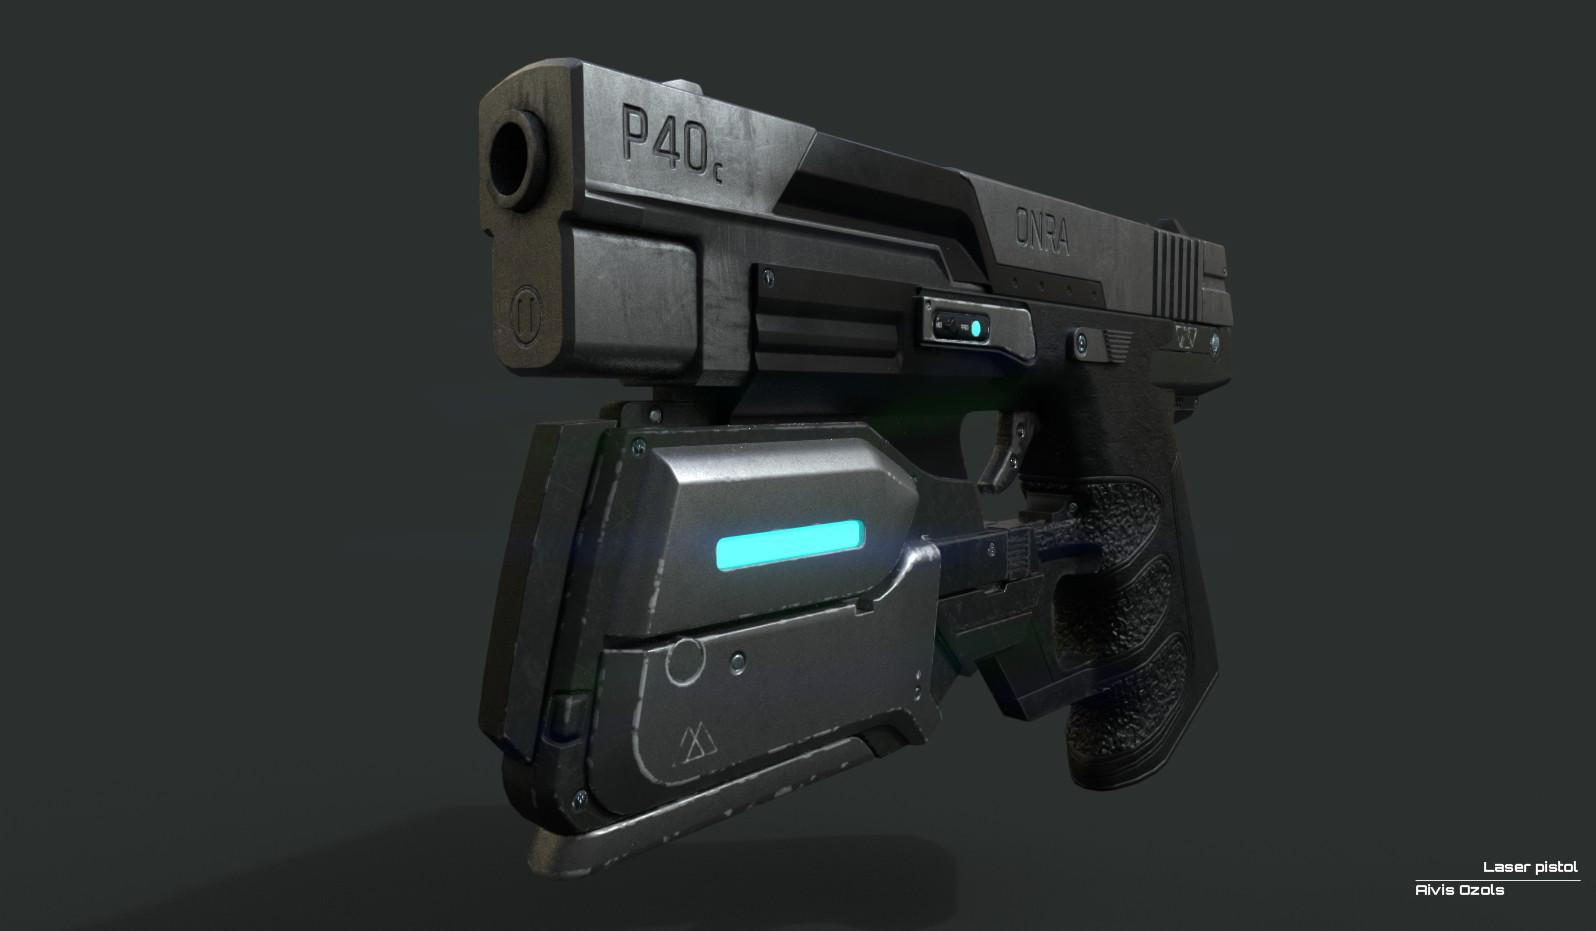 Aivis ozols pistol01